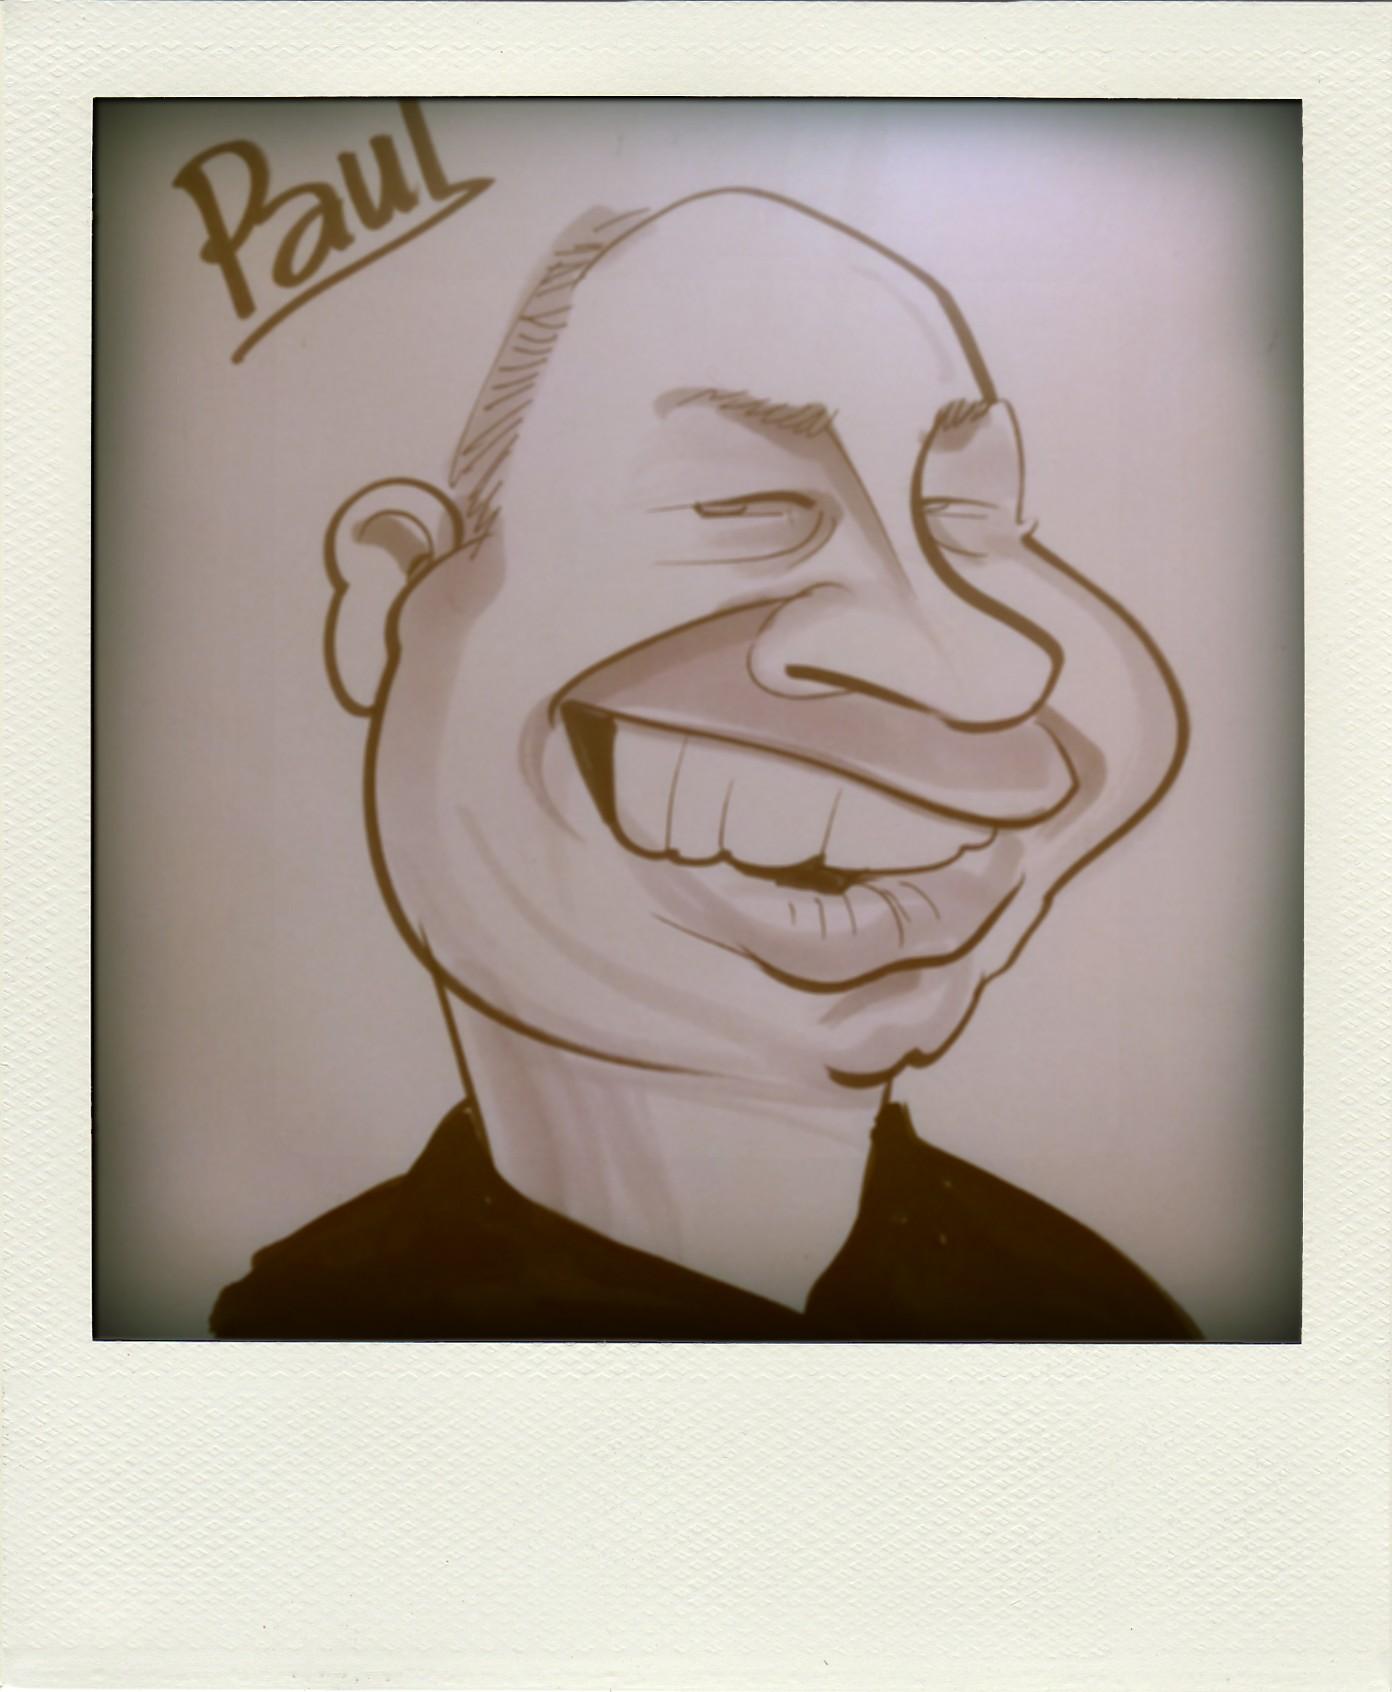 Paul Frear - Altrigen Managing Director